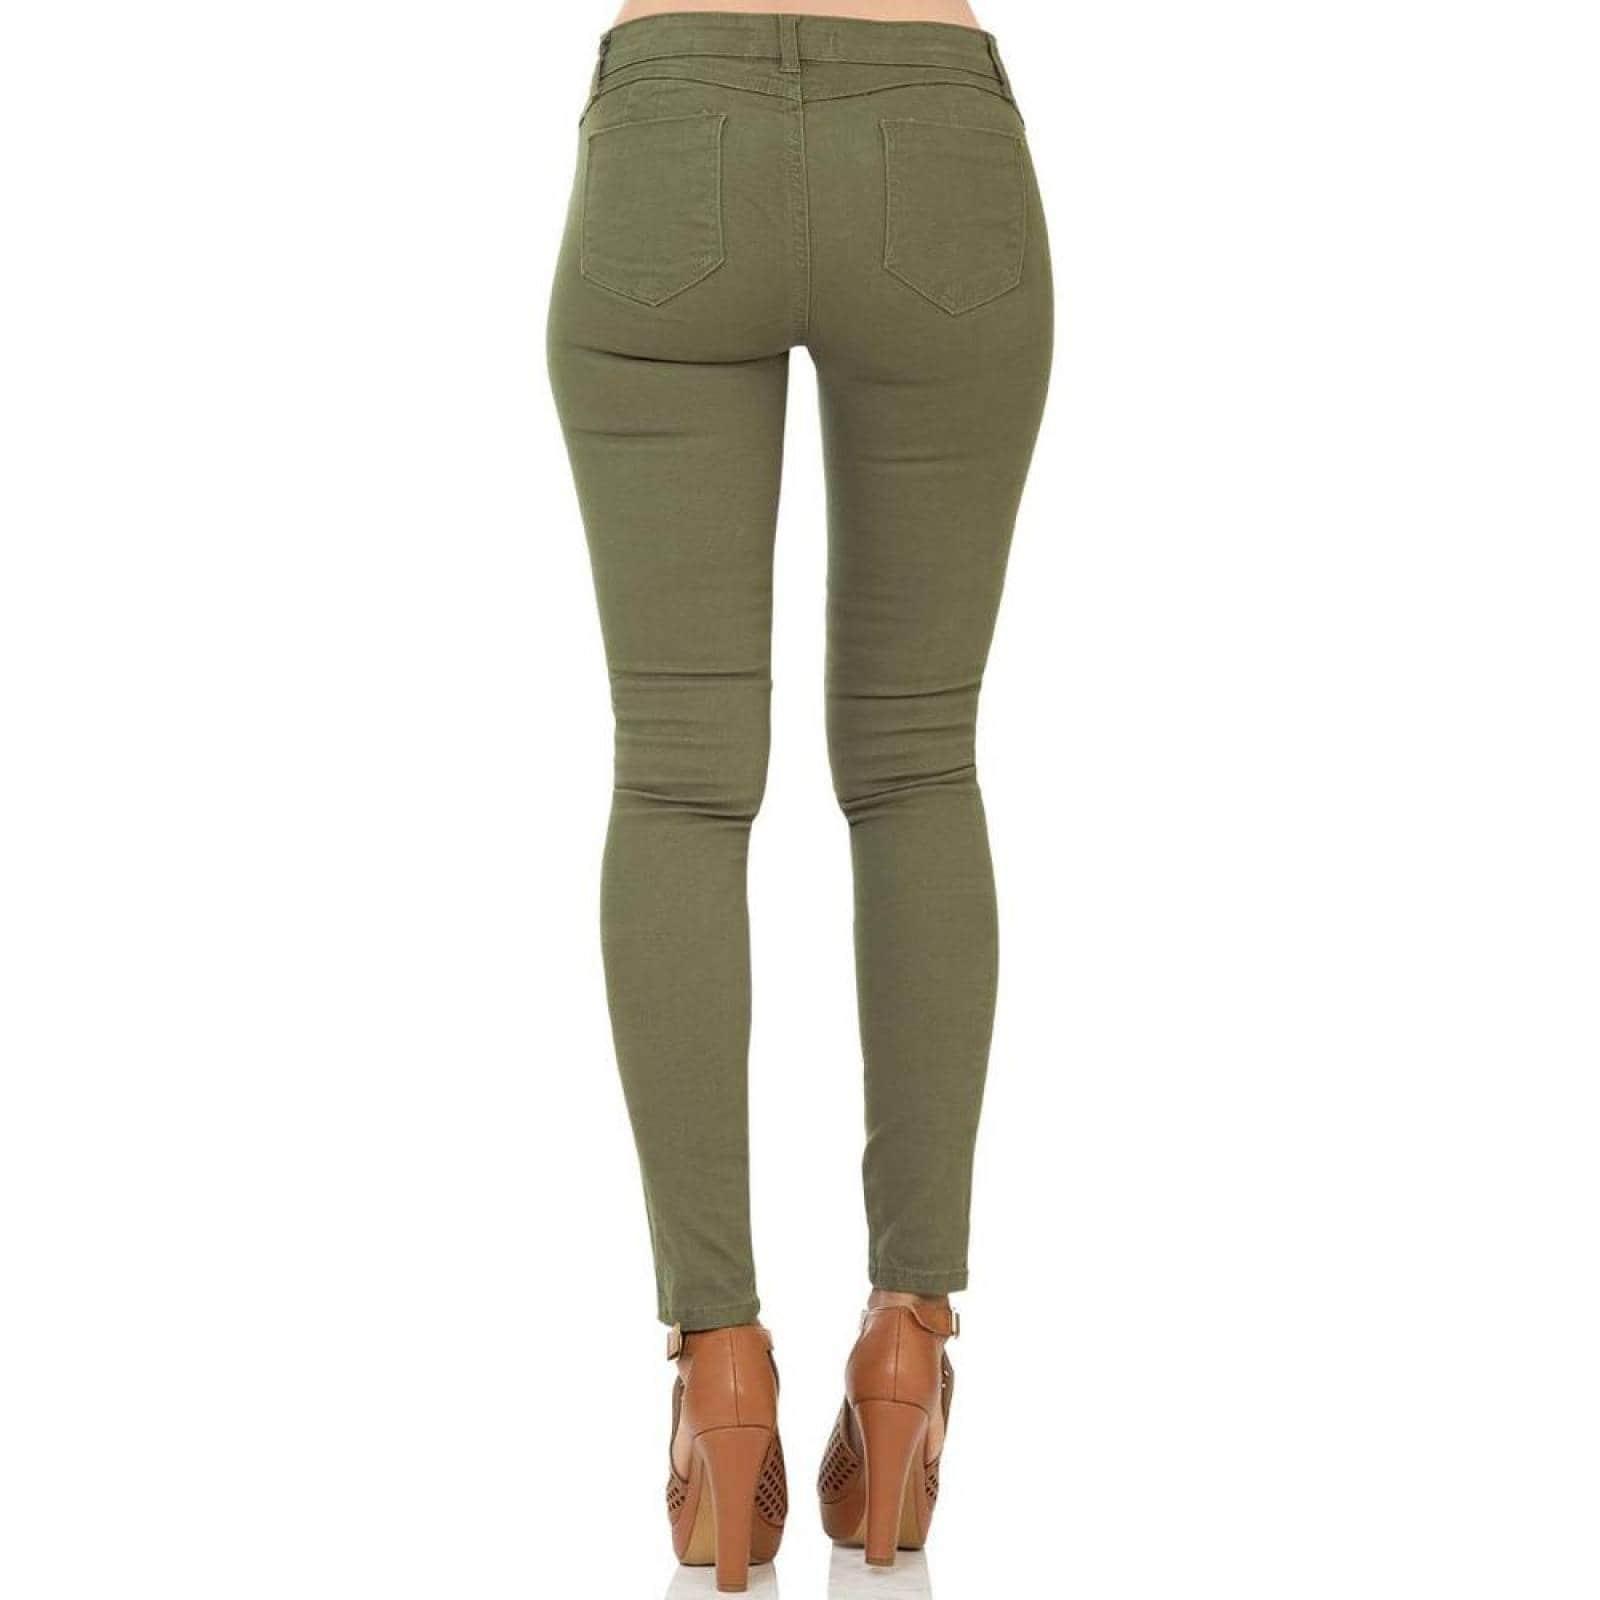 Pantalon Disparate Jeans Mujer Verde GabardinaStretch 4000